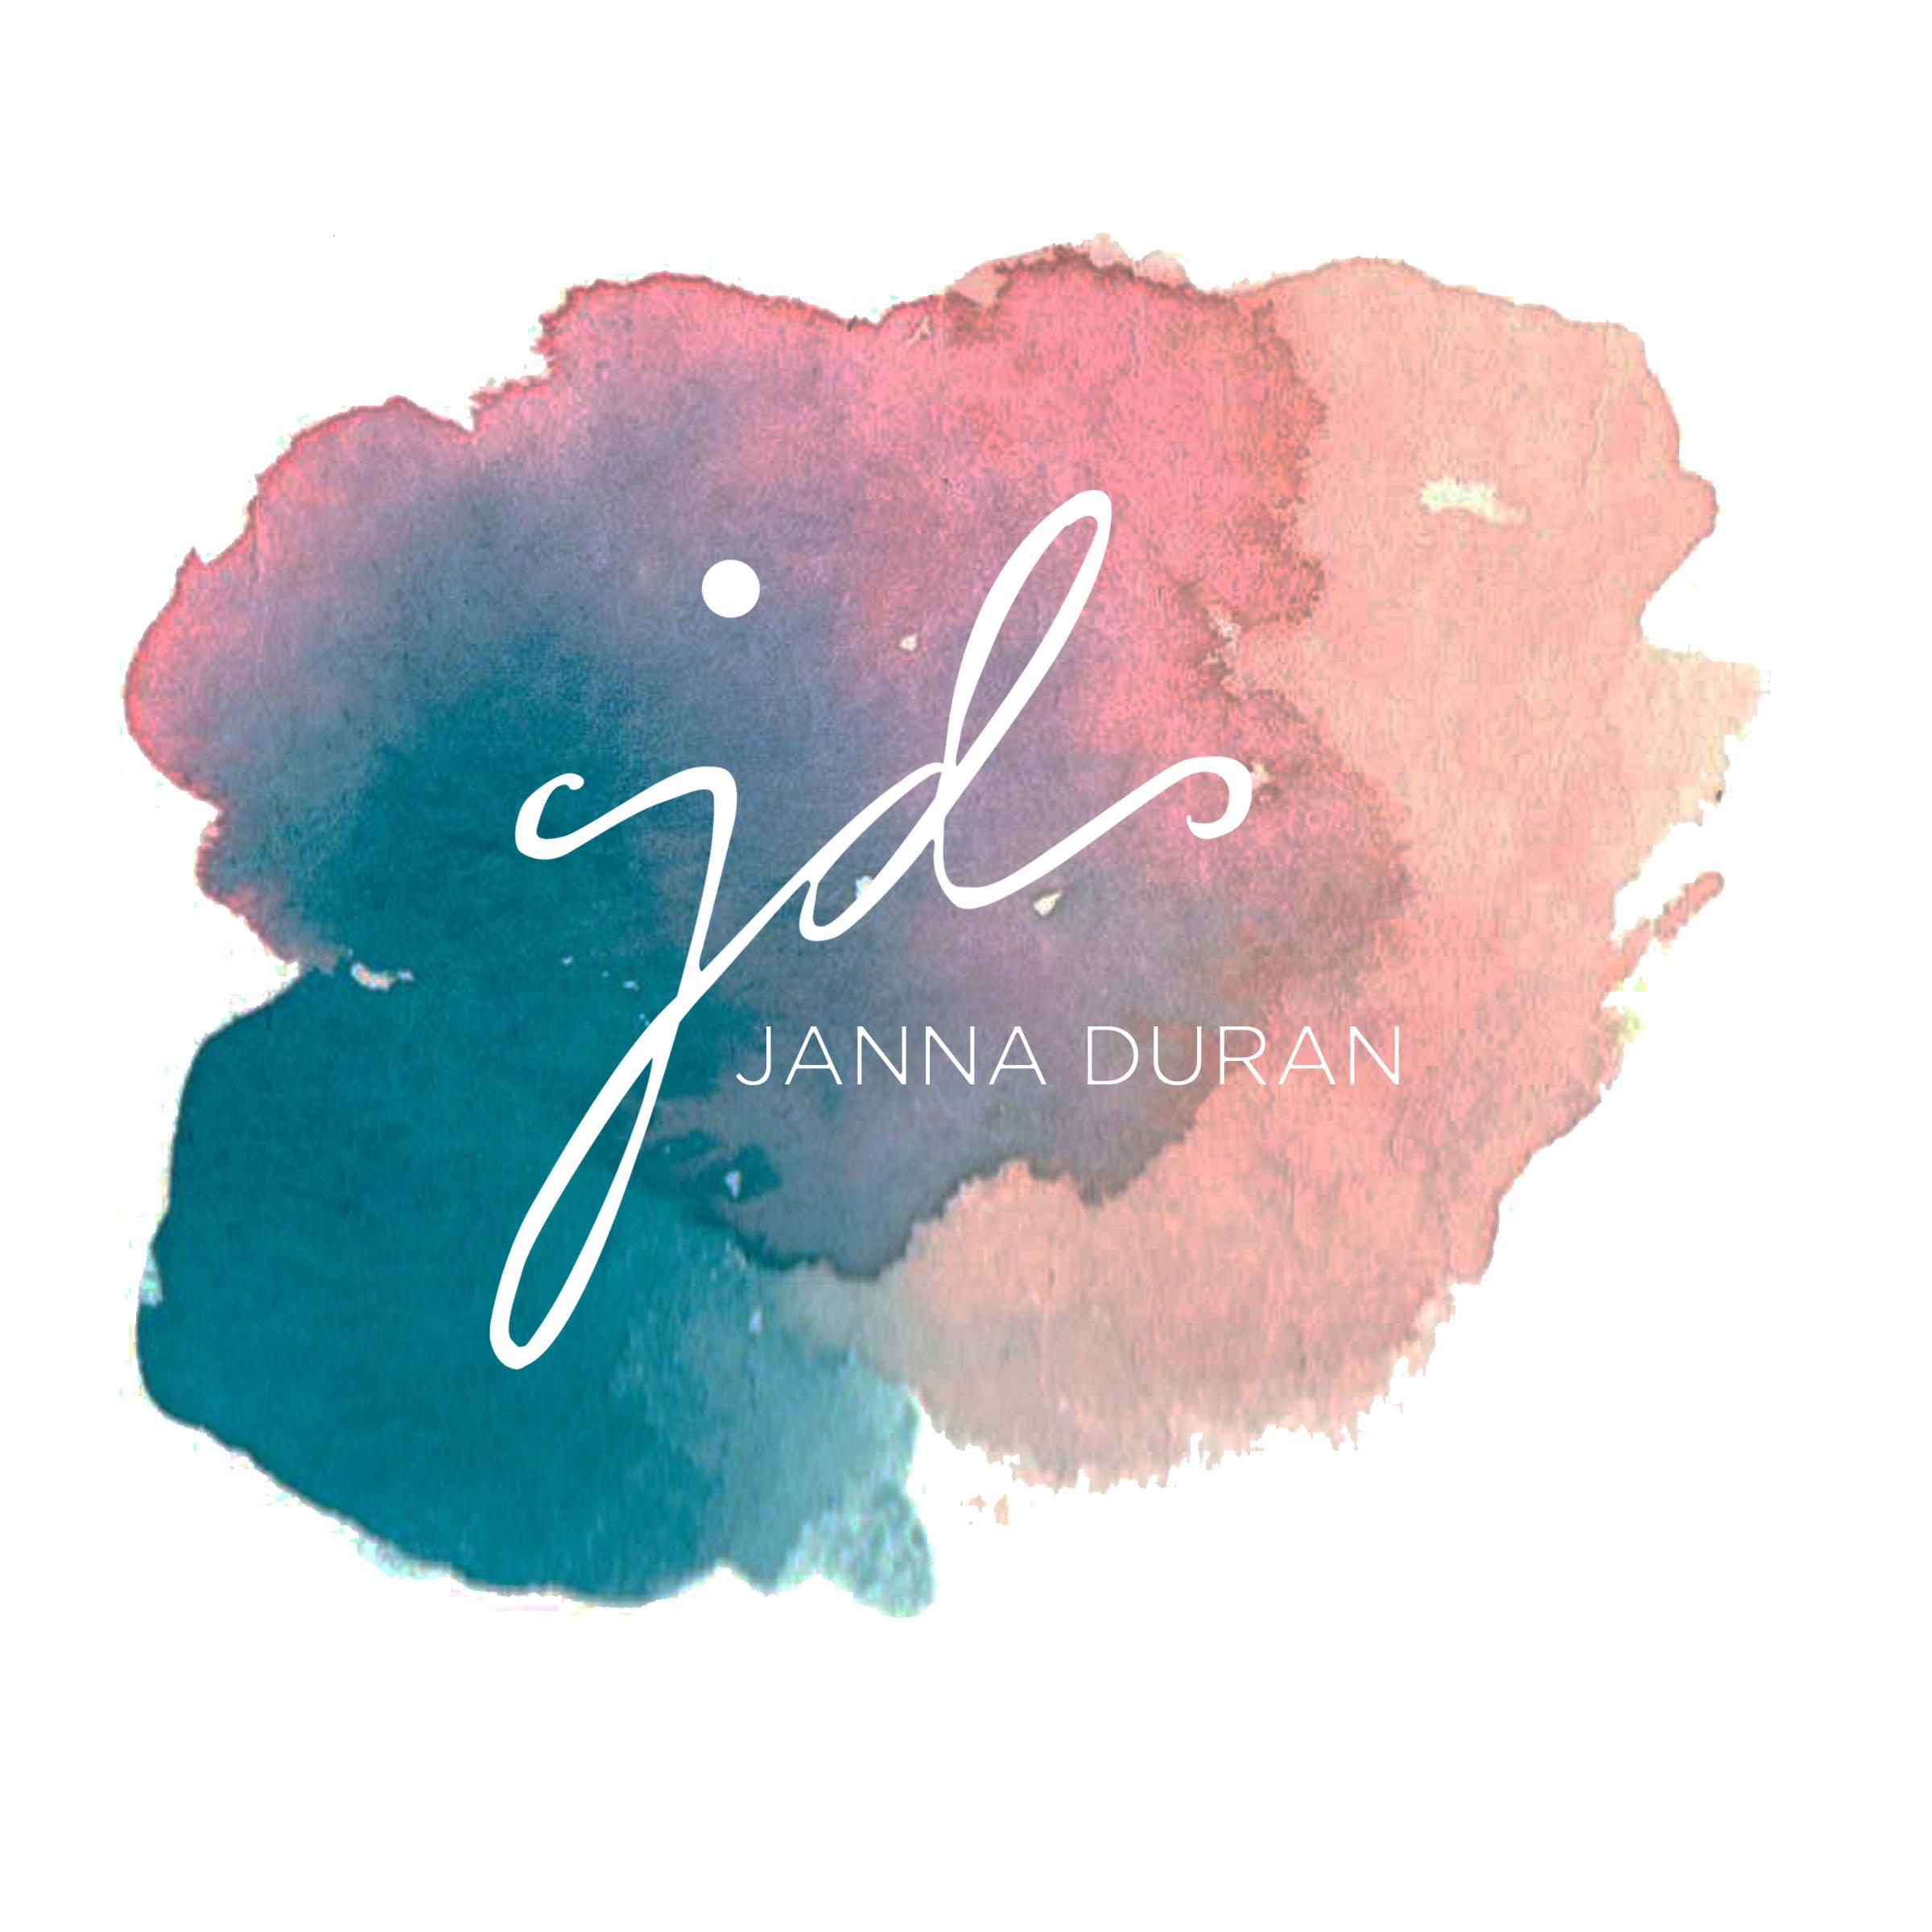 Janna Duran Signature